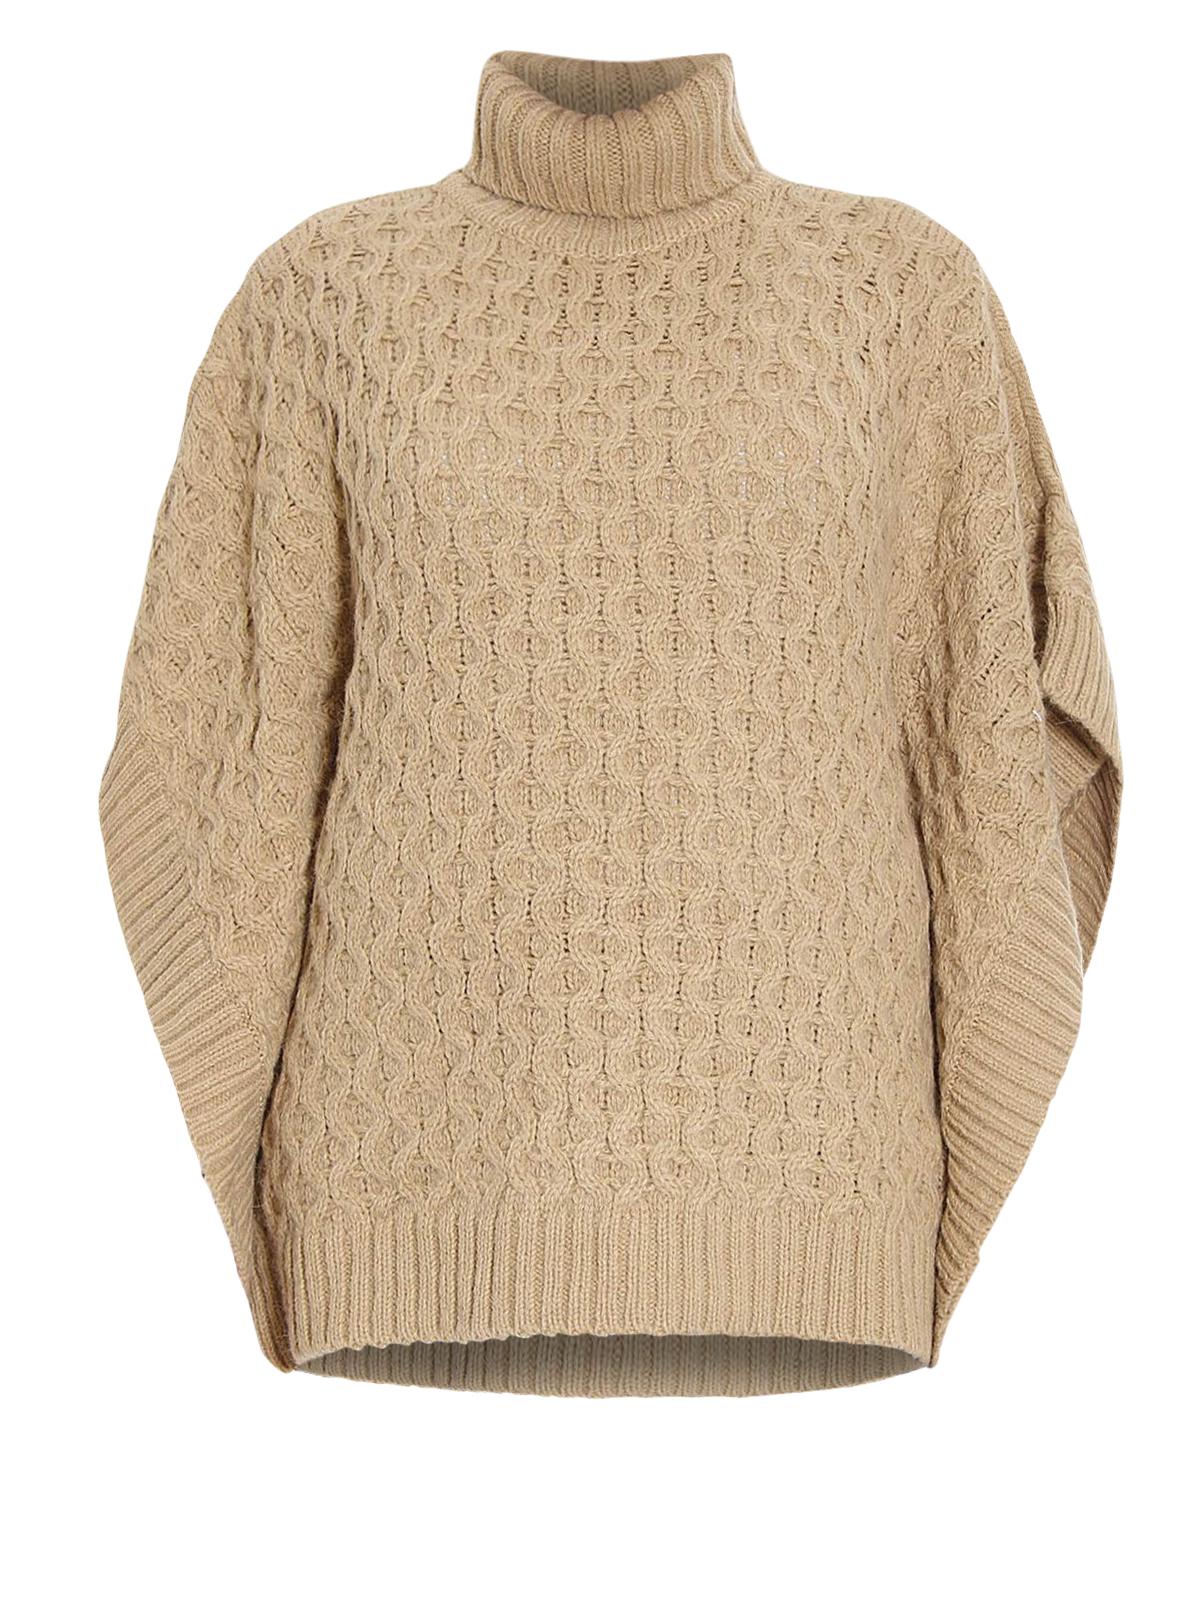 Knitting Ponchos : Alpaca blend knit poncho by michael kors turtlenecks